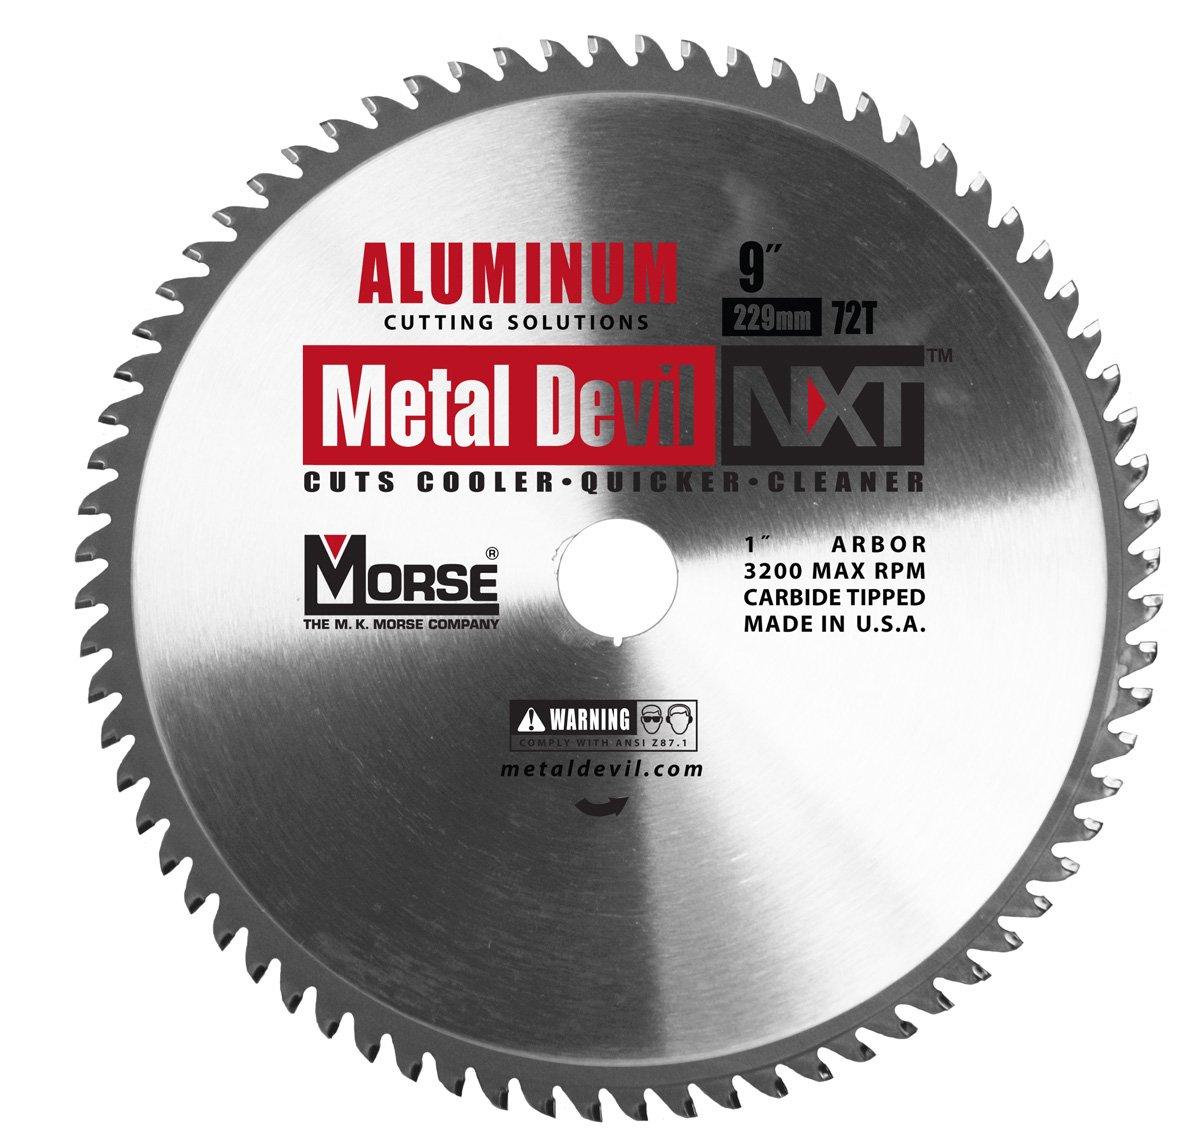 MK Morse  CSM972NAC Metal Devil Circular Saw Blade, Aluminum Application, 9-Inch Diameter, 72 TPI, 1-Inch Arbor